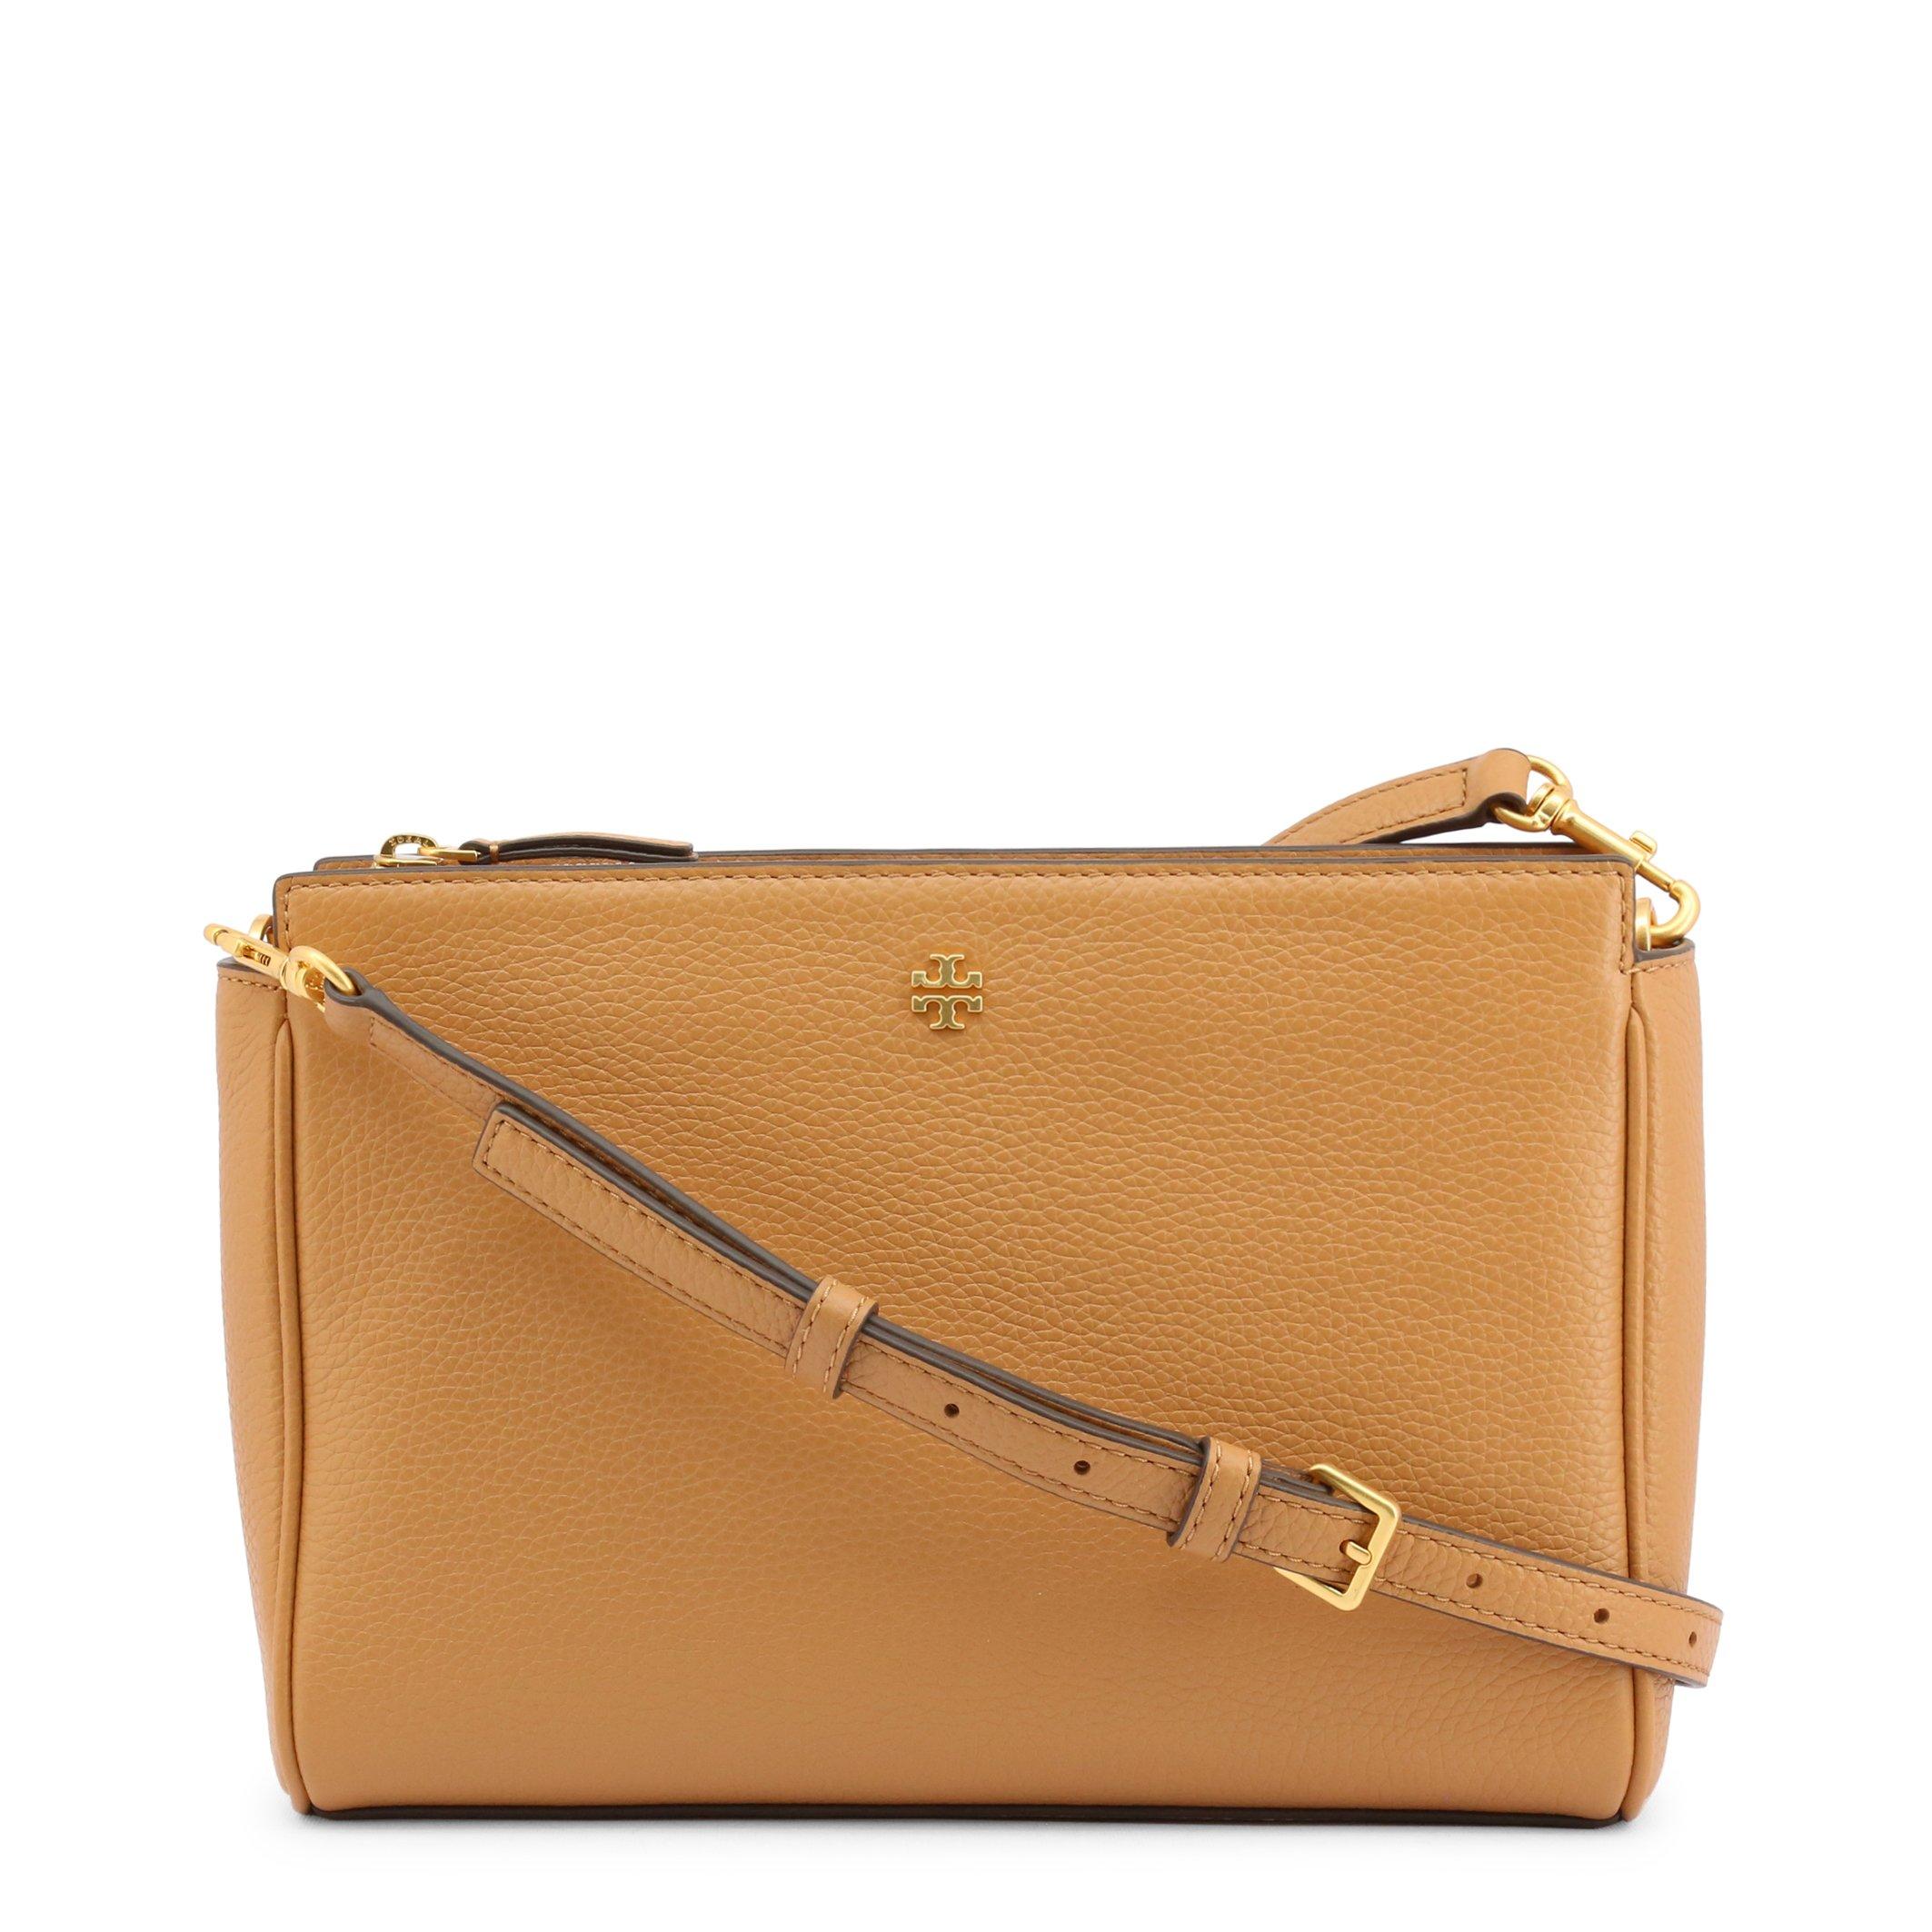 Tory Burch Women's Crossbody Bag Various Colours 74101 - brown NOSIZE